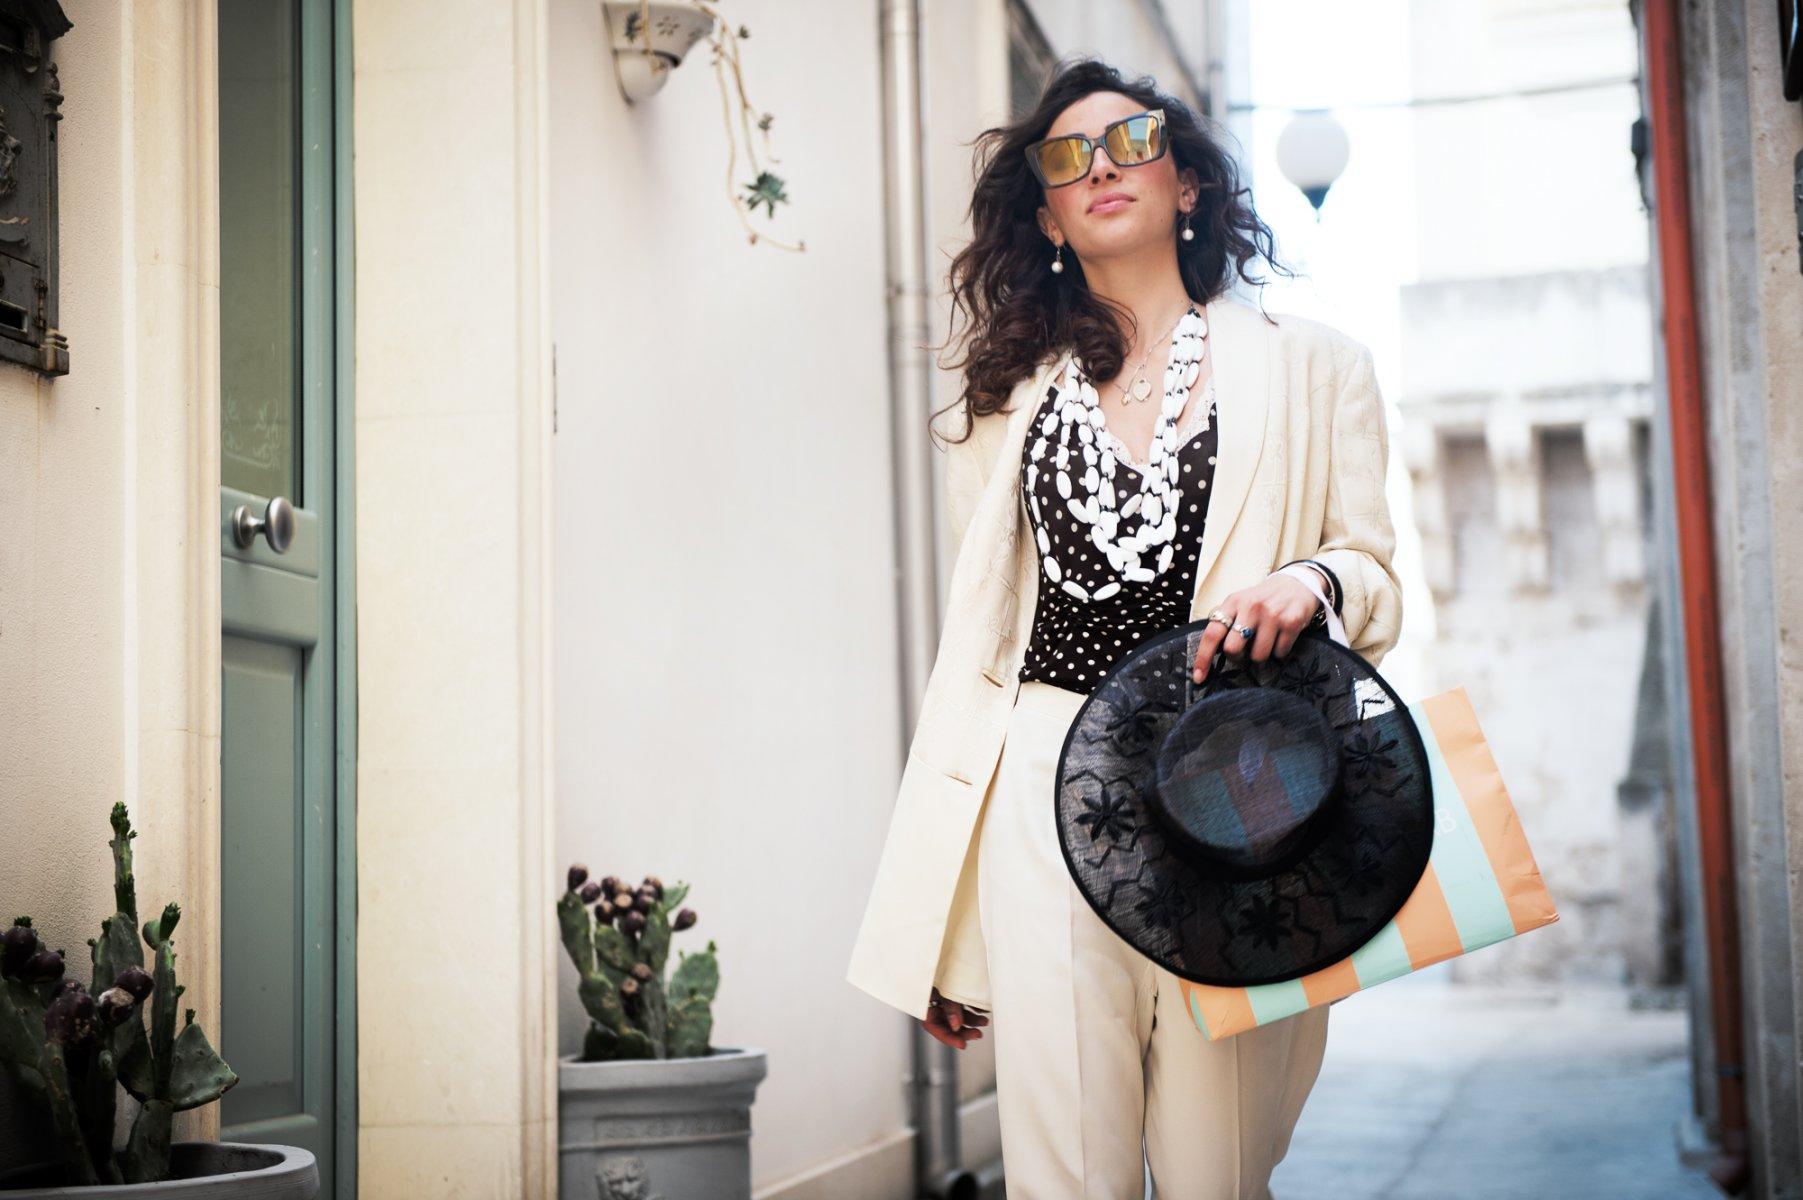 168-Pretty_Woman_MMD9458 Fashion/Adv